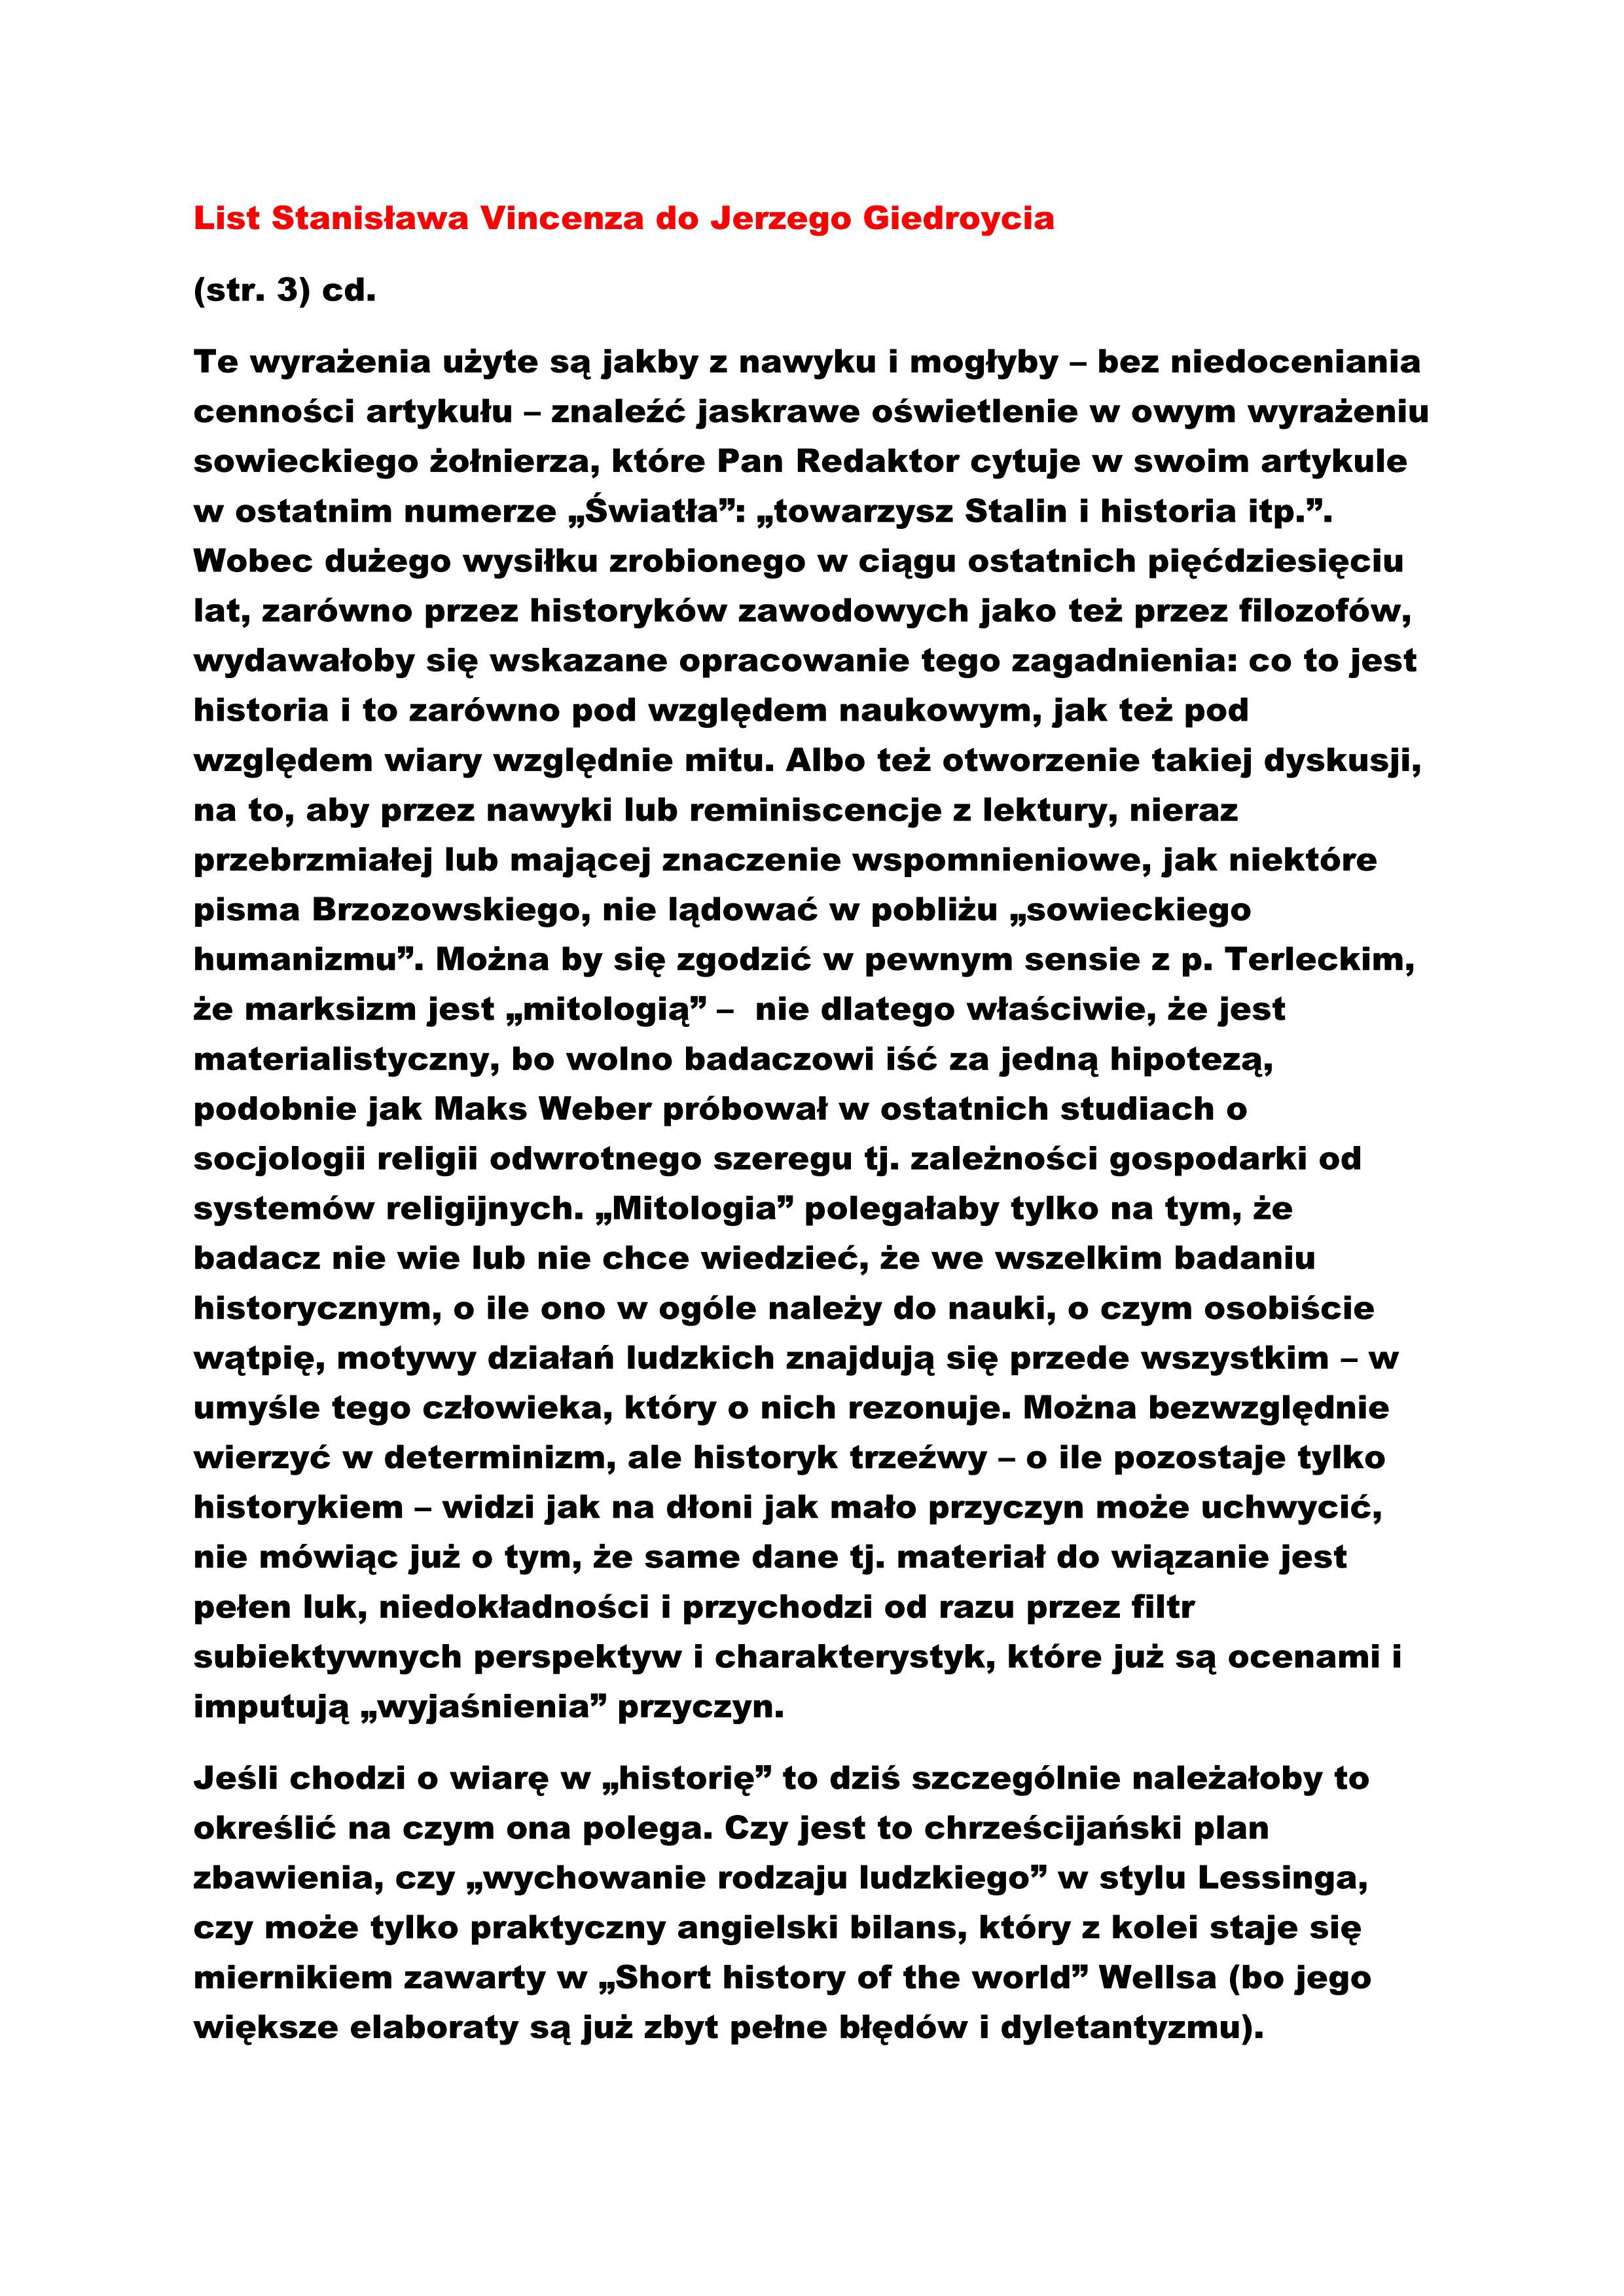 <div class='inner-box'><div class='close-desc'></div><span class='opis'>List Stanisława Vincenza na temat pierwszego numeru &quot;Kultury&quot; (str. 3)</span><div class='clearfix'></div><span>Sygn. sm00313</span><div class='clearfix'></div><span>&copy; Instytut Literacki</span></div>